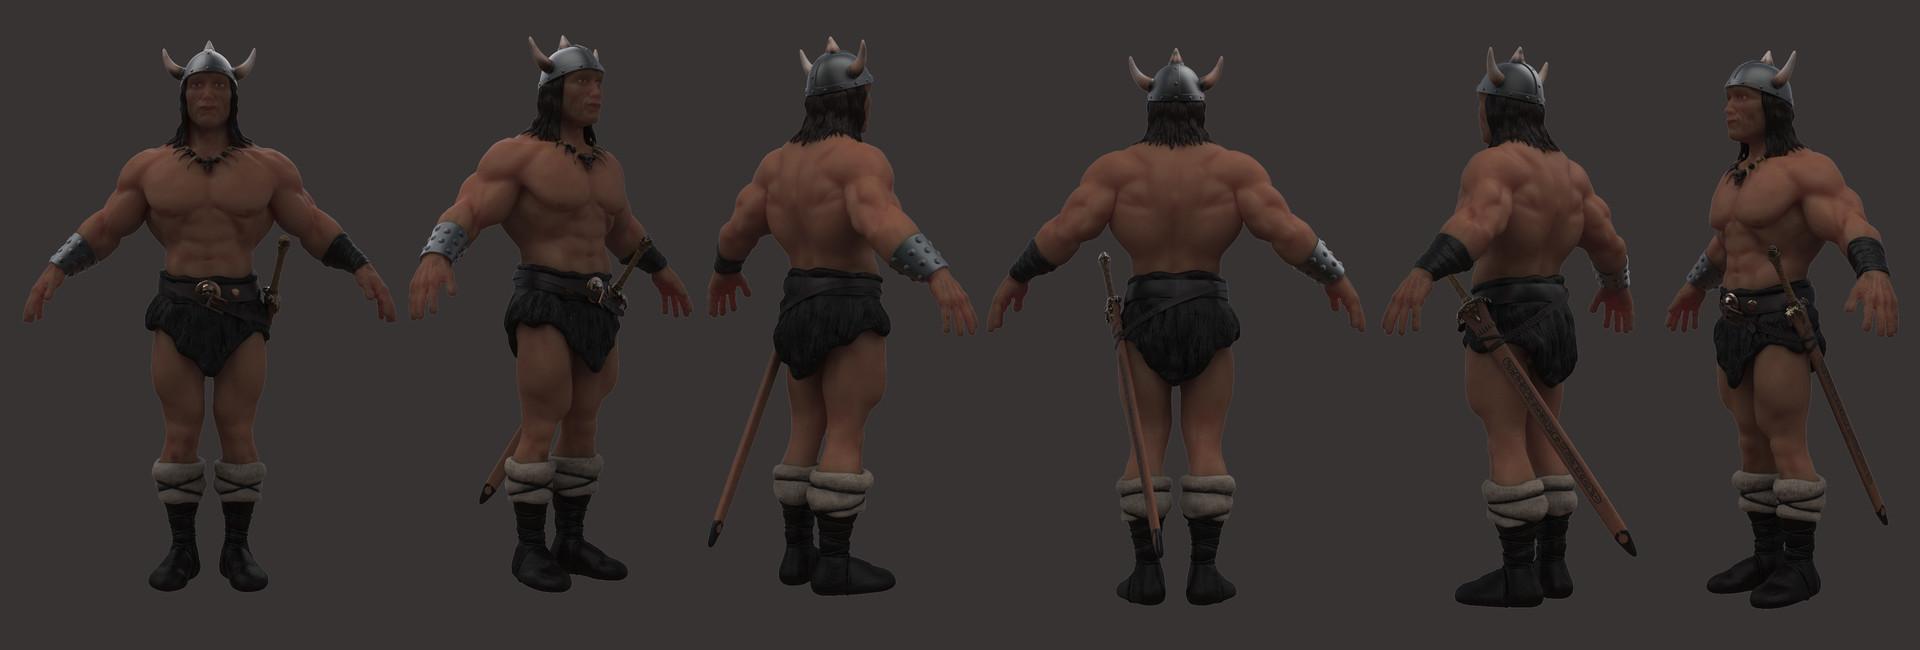 Diego Lujan Conan The Barbarian